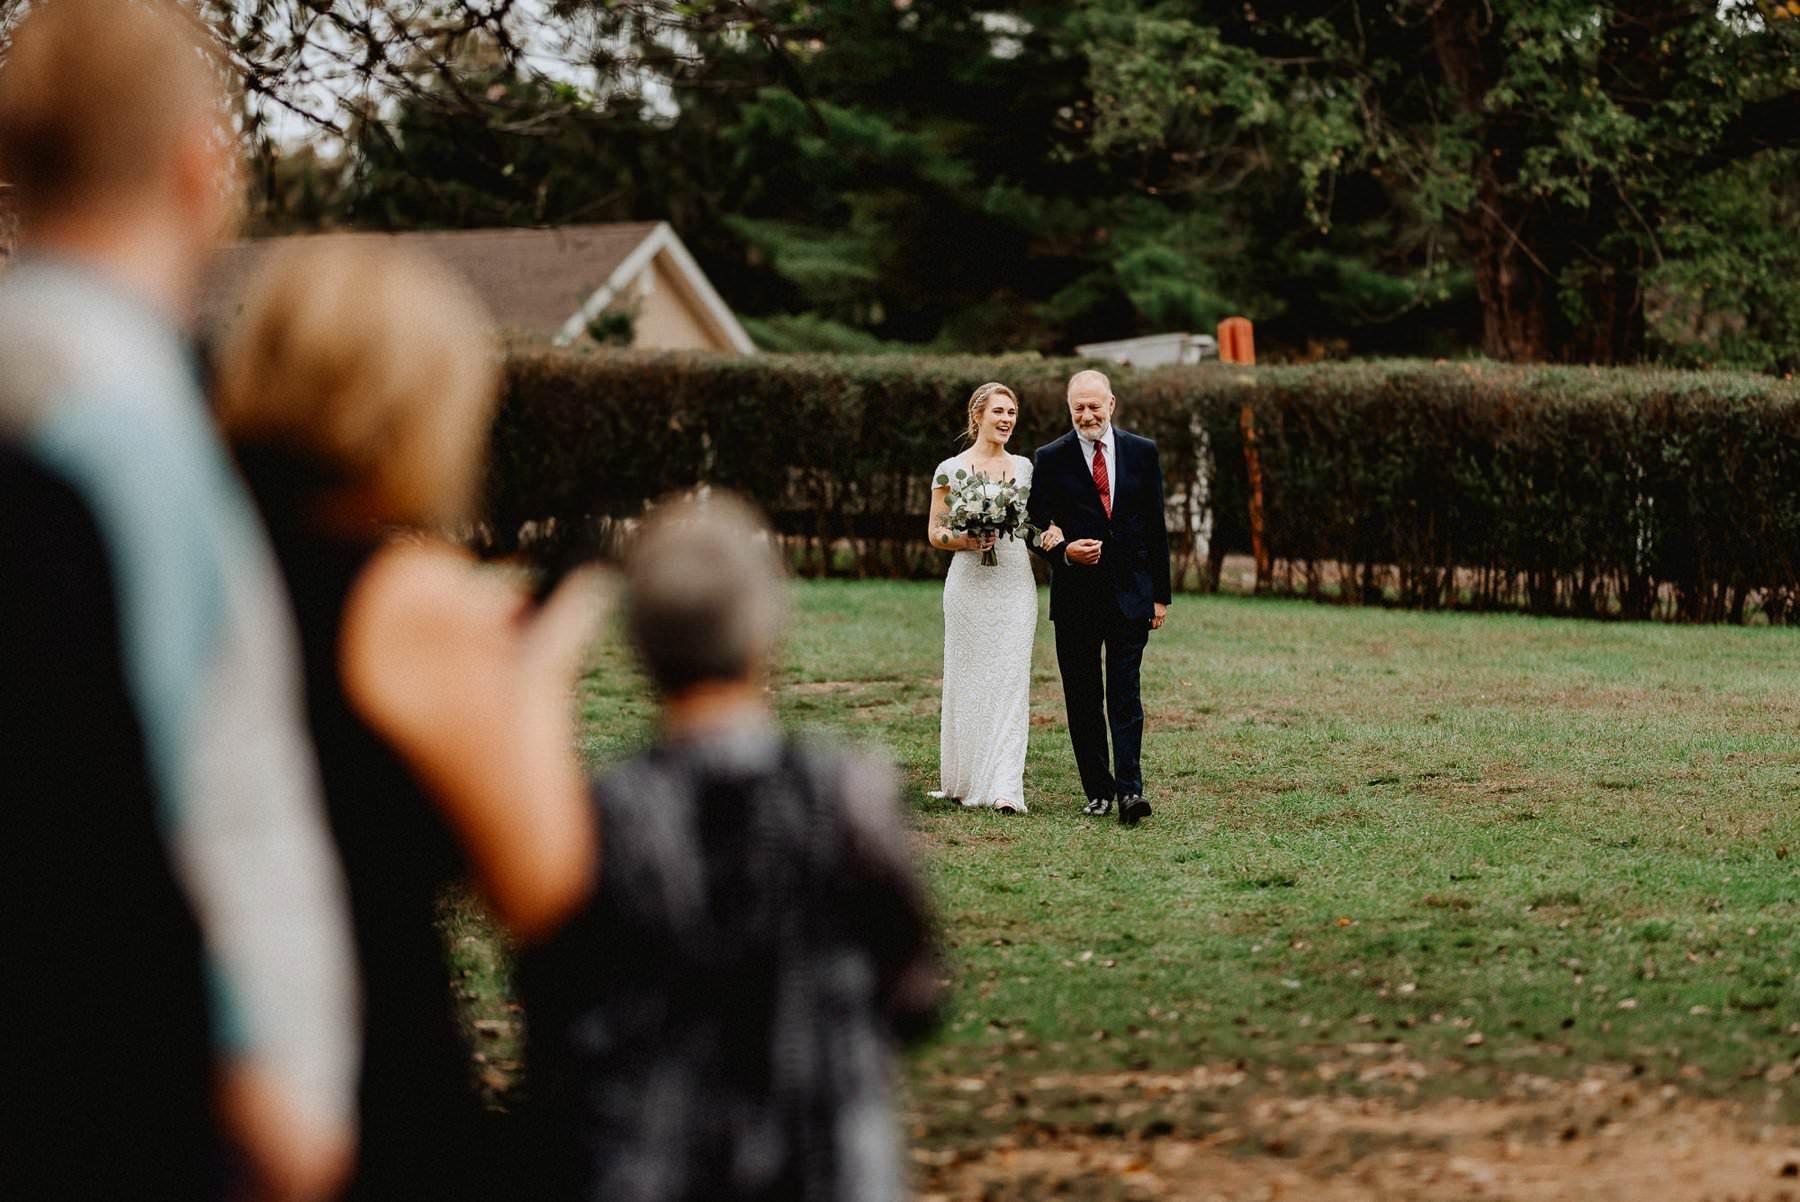 John_James_Audubon_Center_wedding-40.jpg